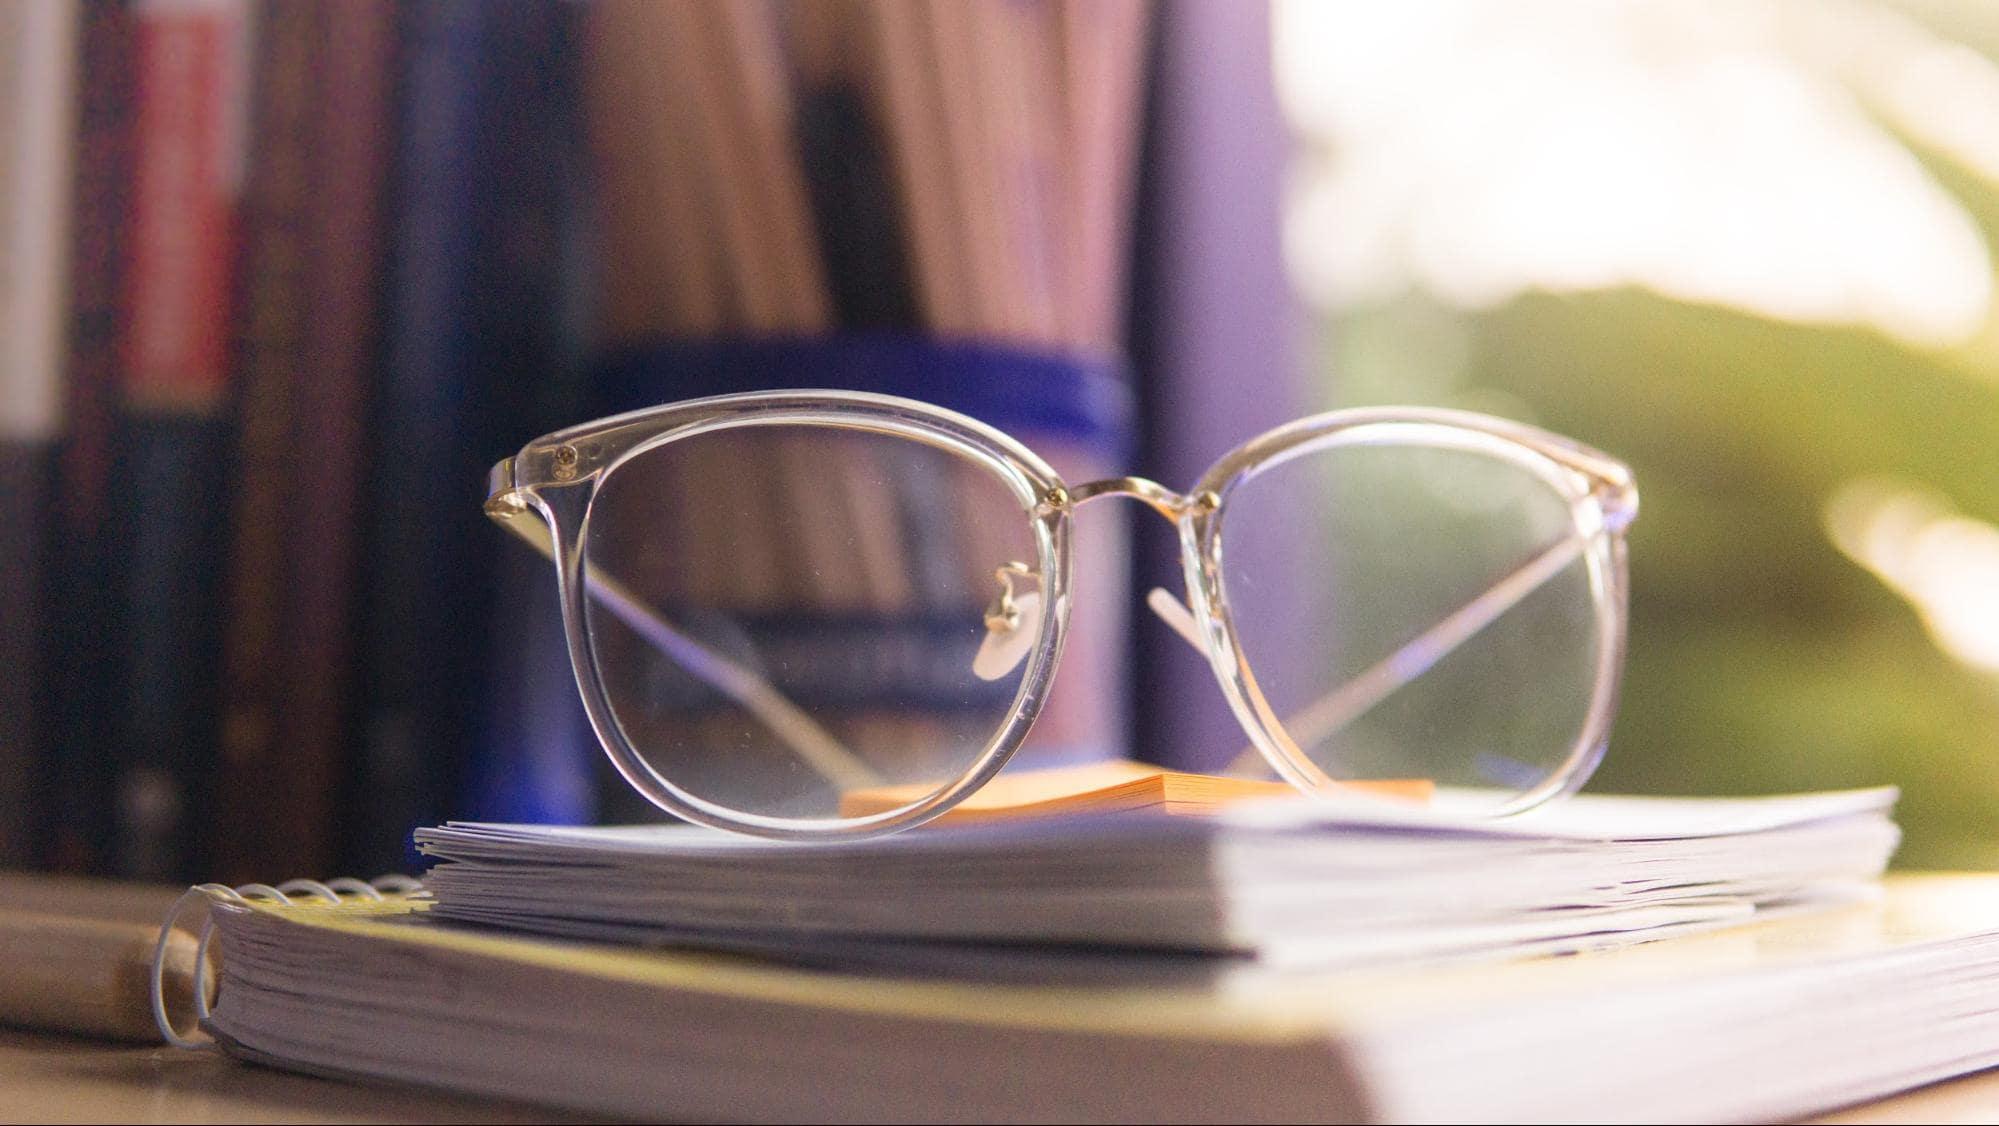 3Dプリンターで医療用メガネを作るFitzが医療従事者を救う